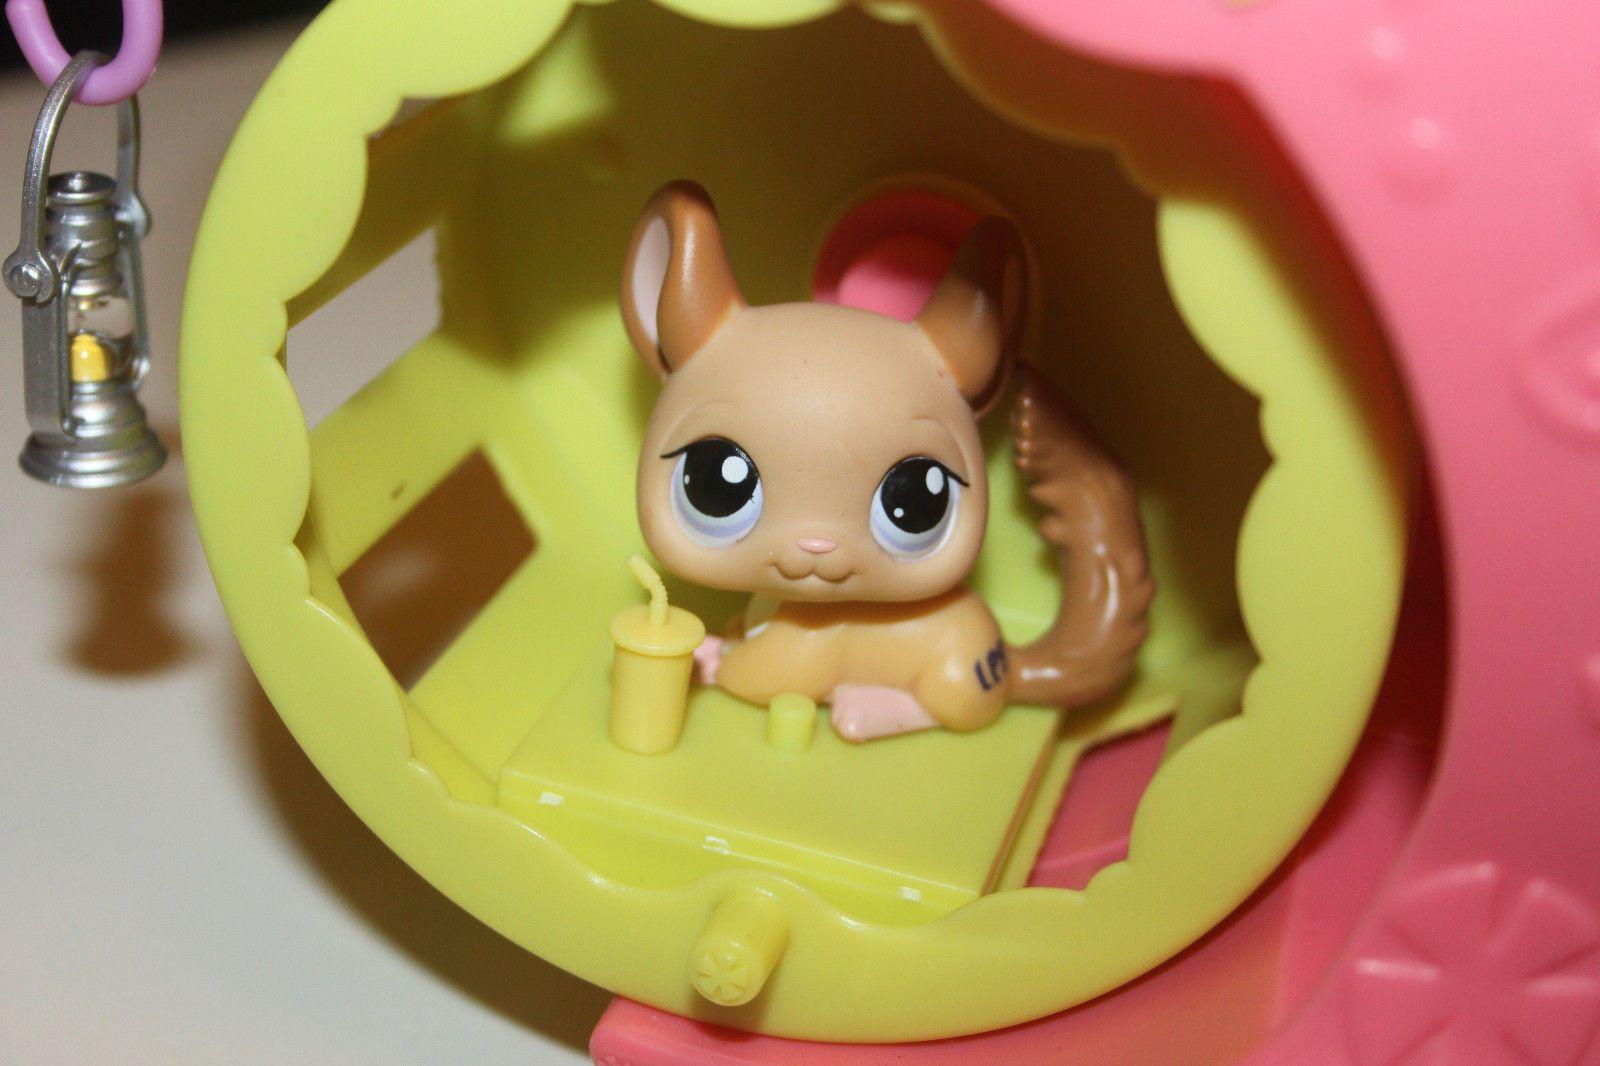 Hasbro Littlest Pet Shop Paw Powered Cruiser Car Vehicle